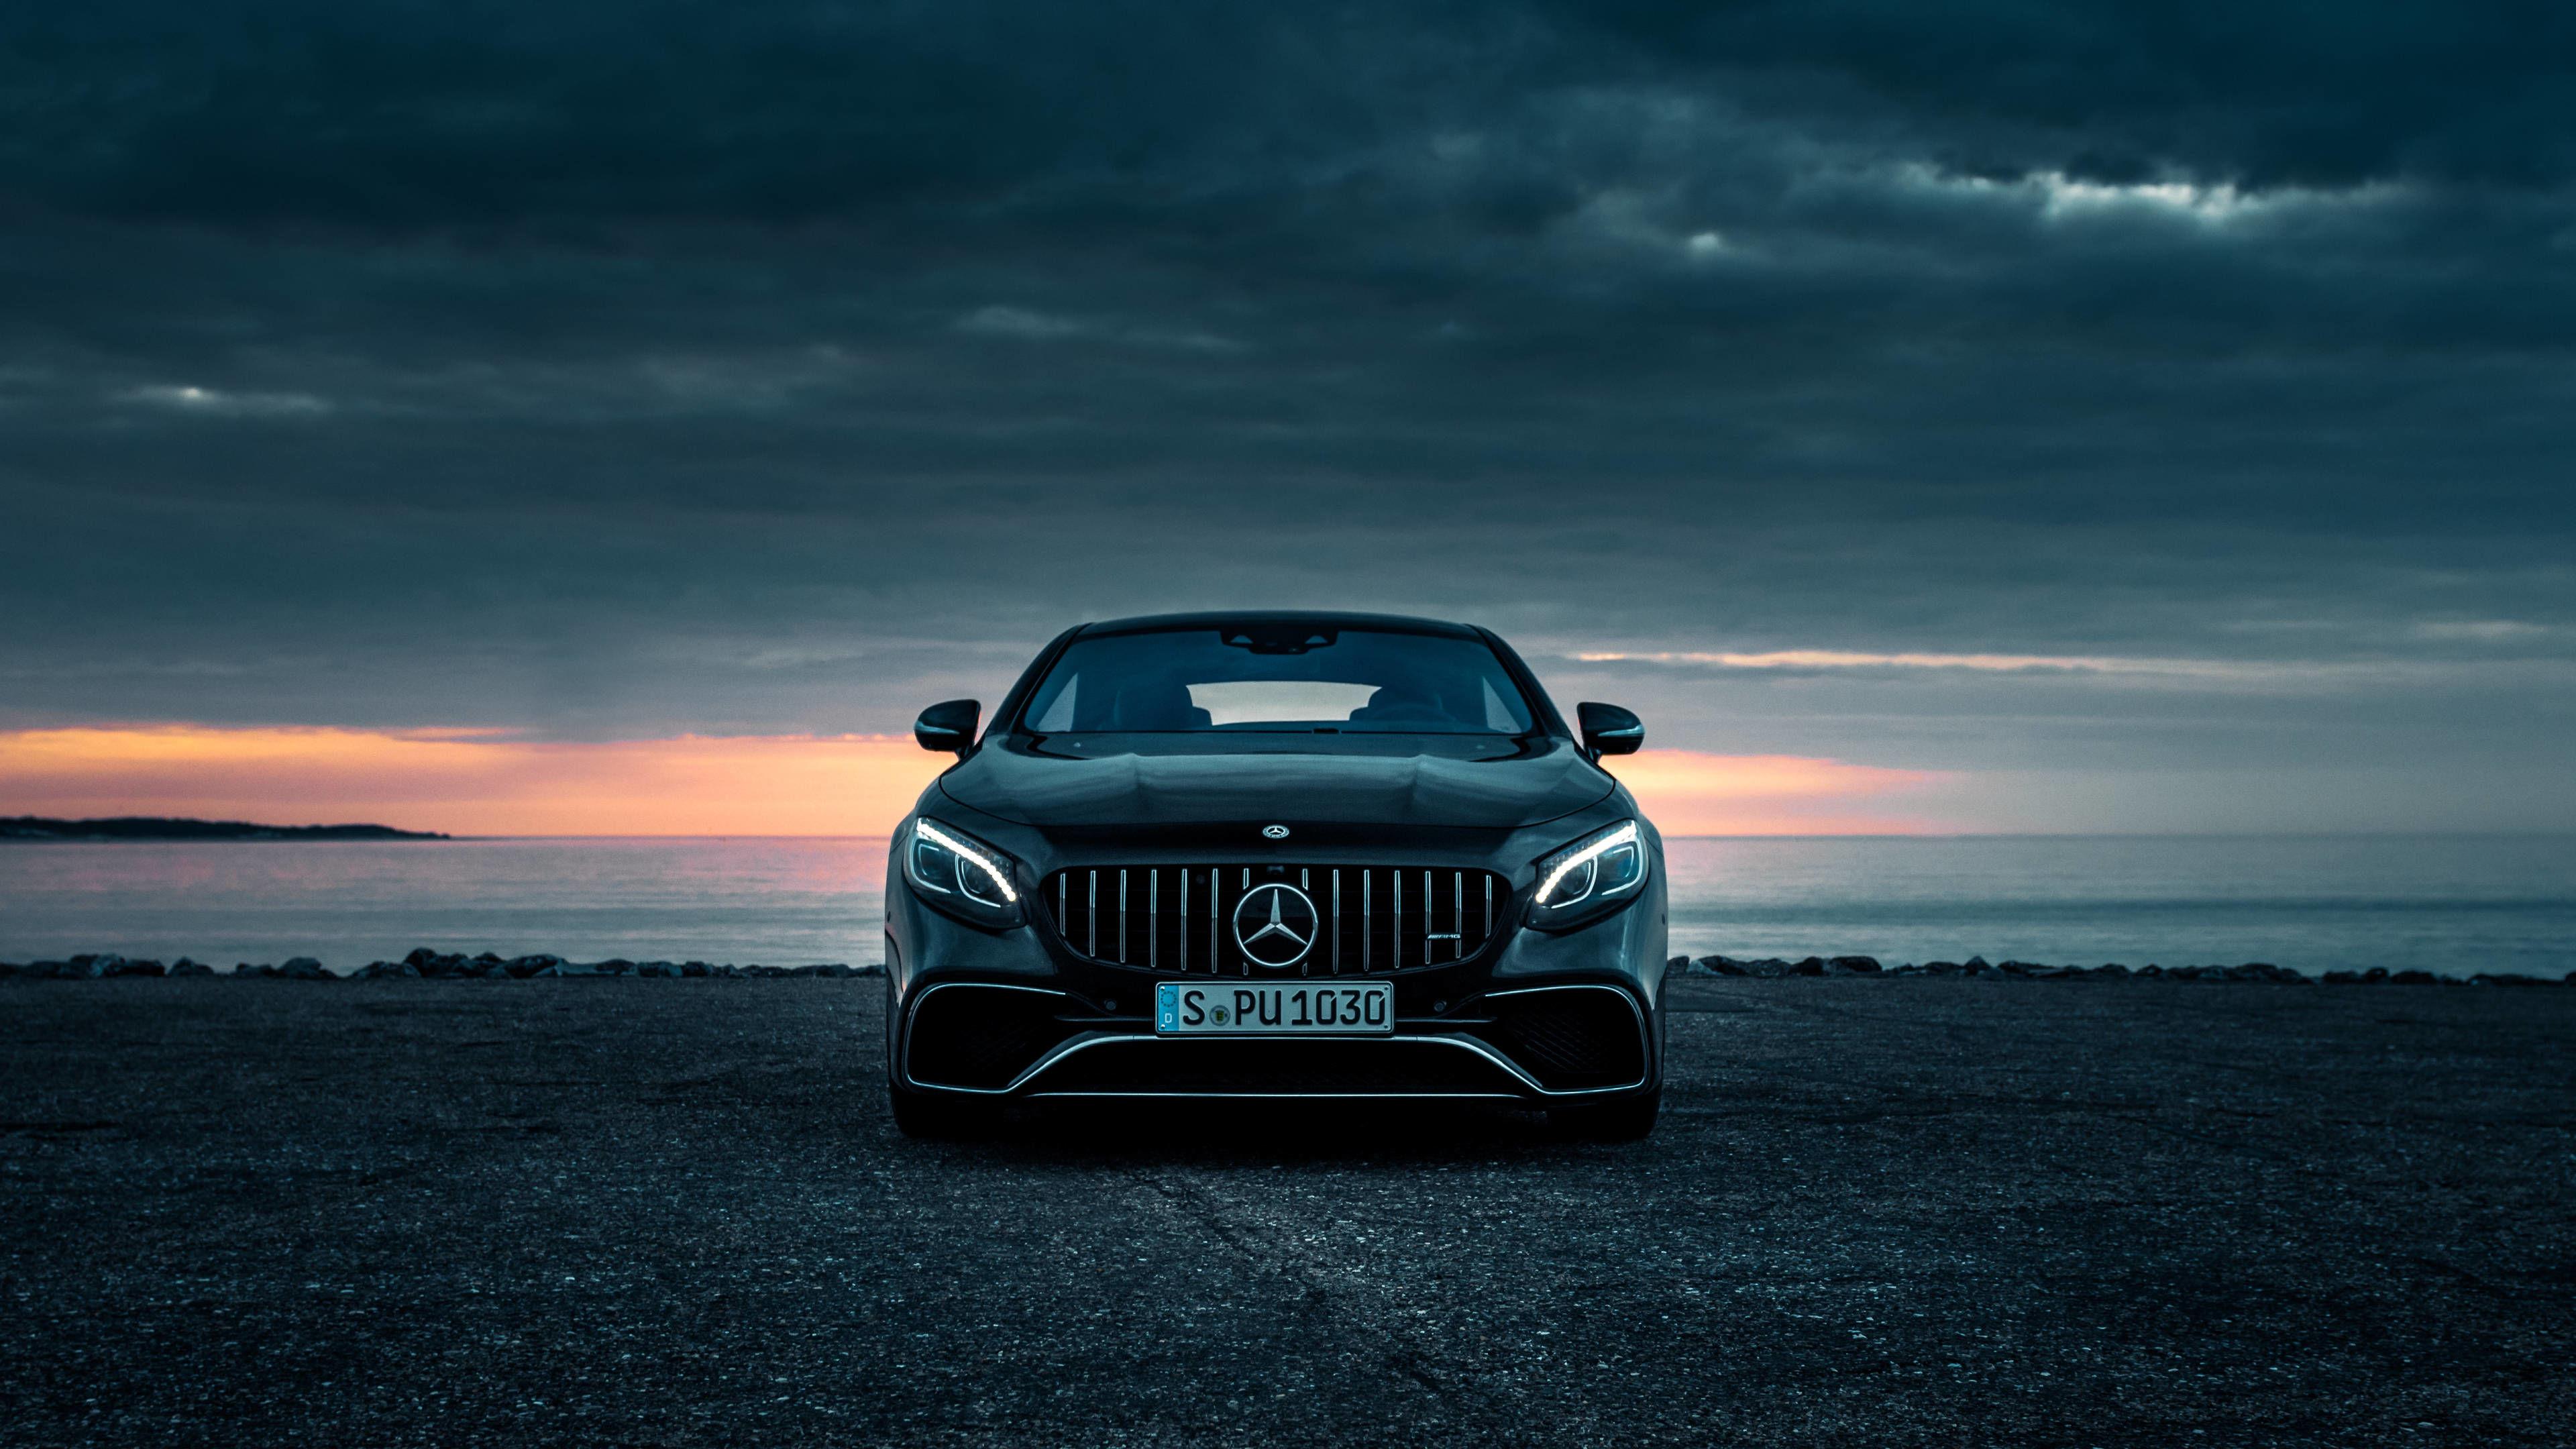 Mercedes-AMG S 65 Coupé Wallpaper | #MBsocialcar